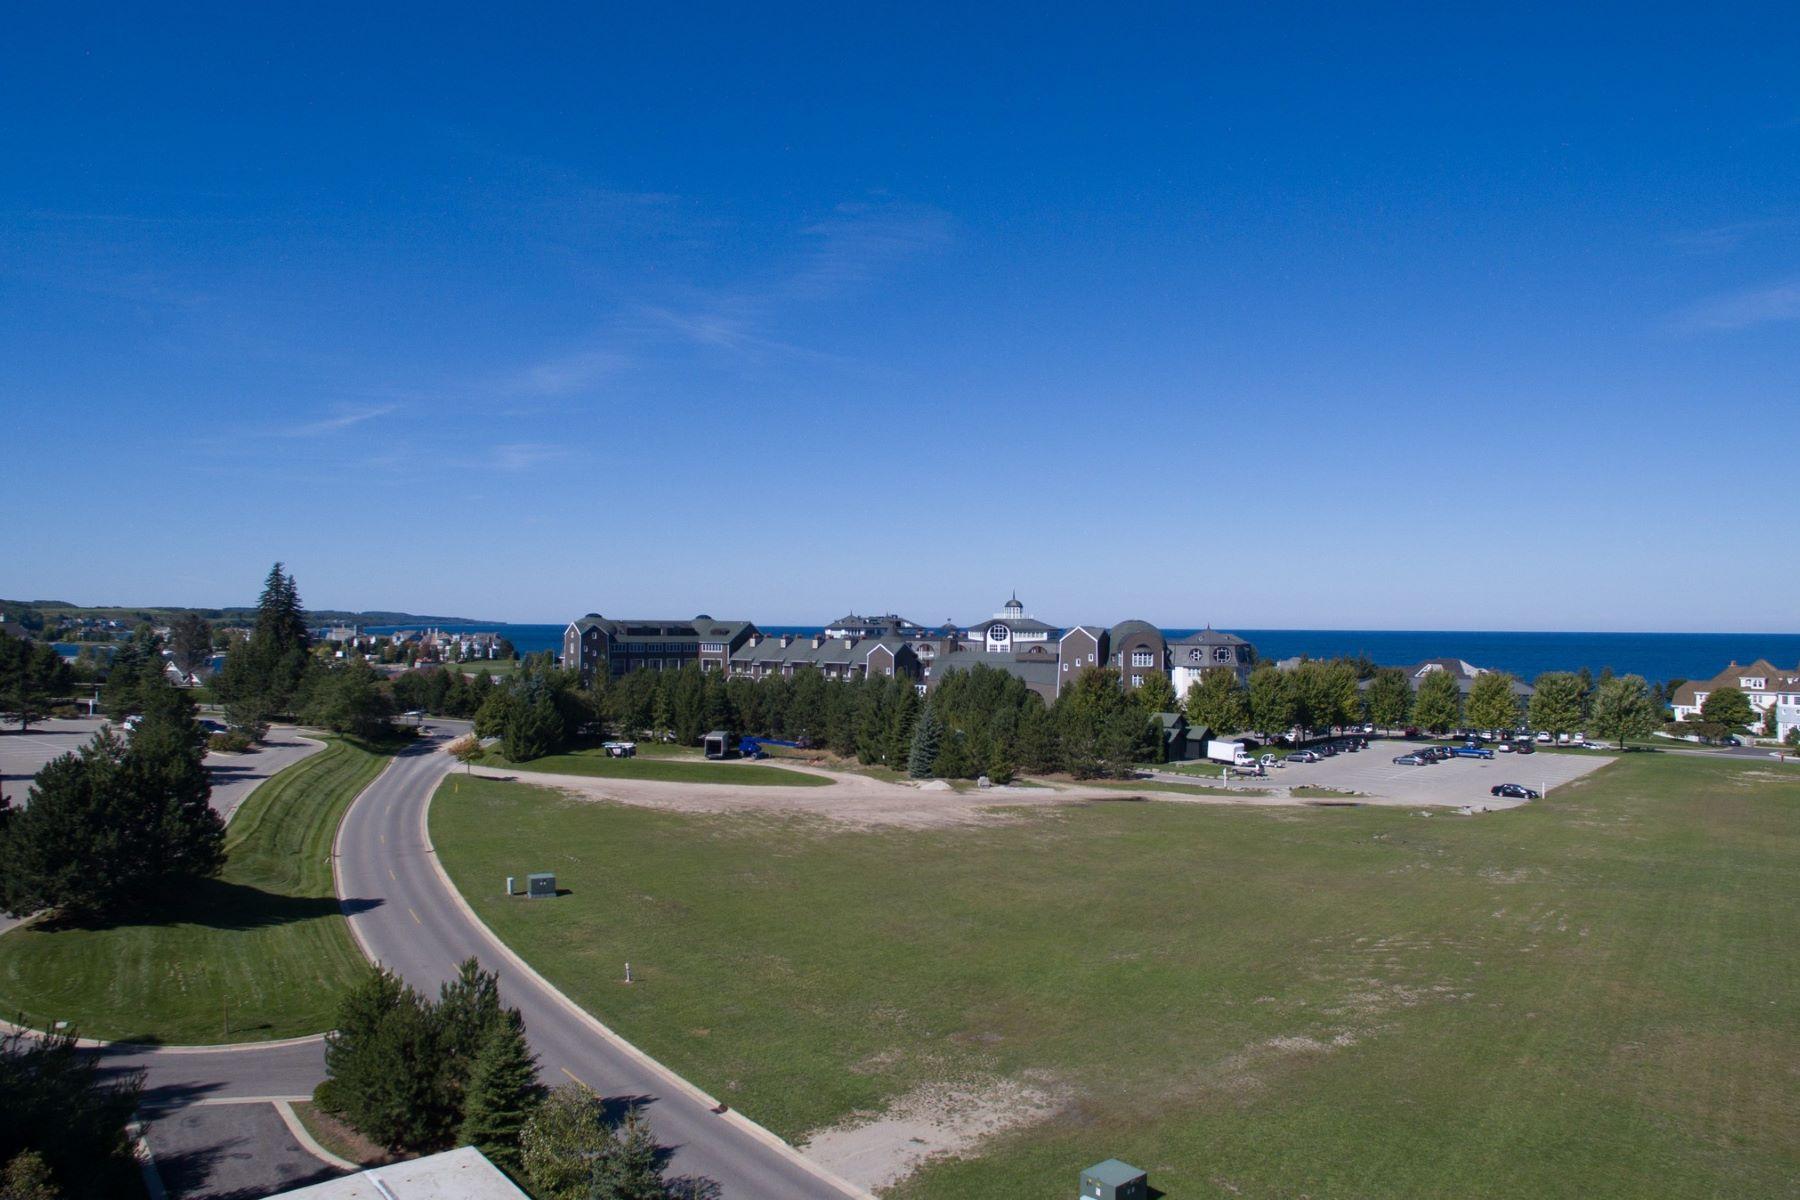 Land for Sale at Unit 11, The Ridge 3728 Cliffs Drive, Unit 11, The Ridge Bay Harbor, Michigan, 49770 United States